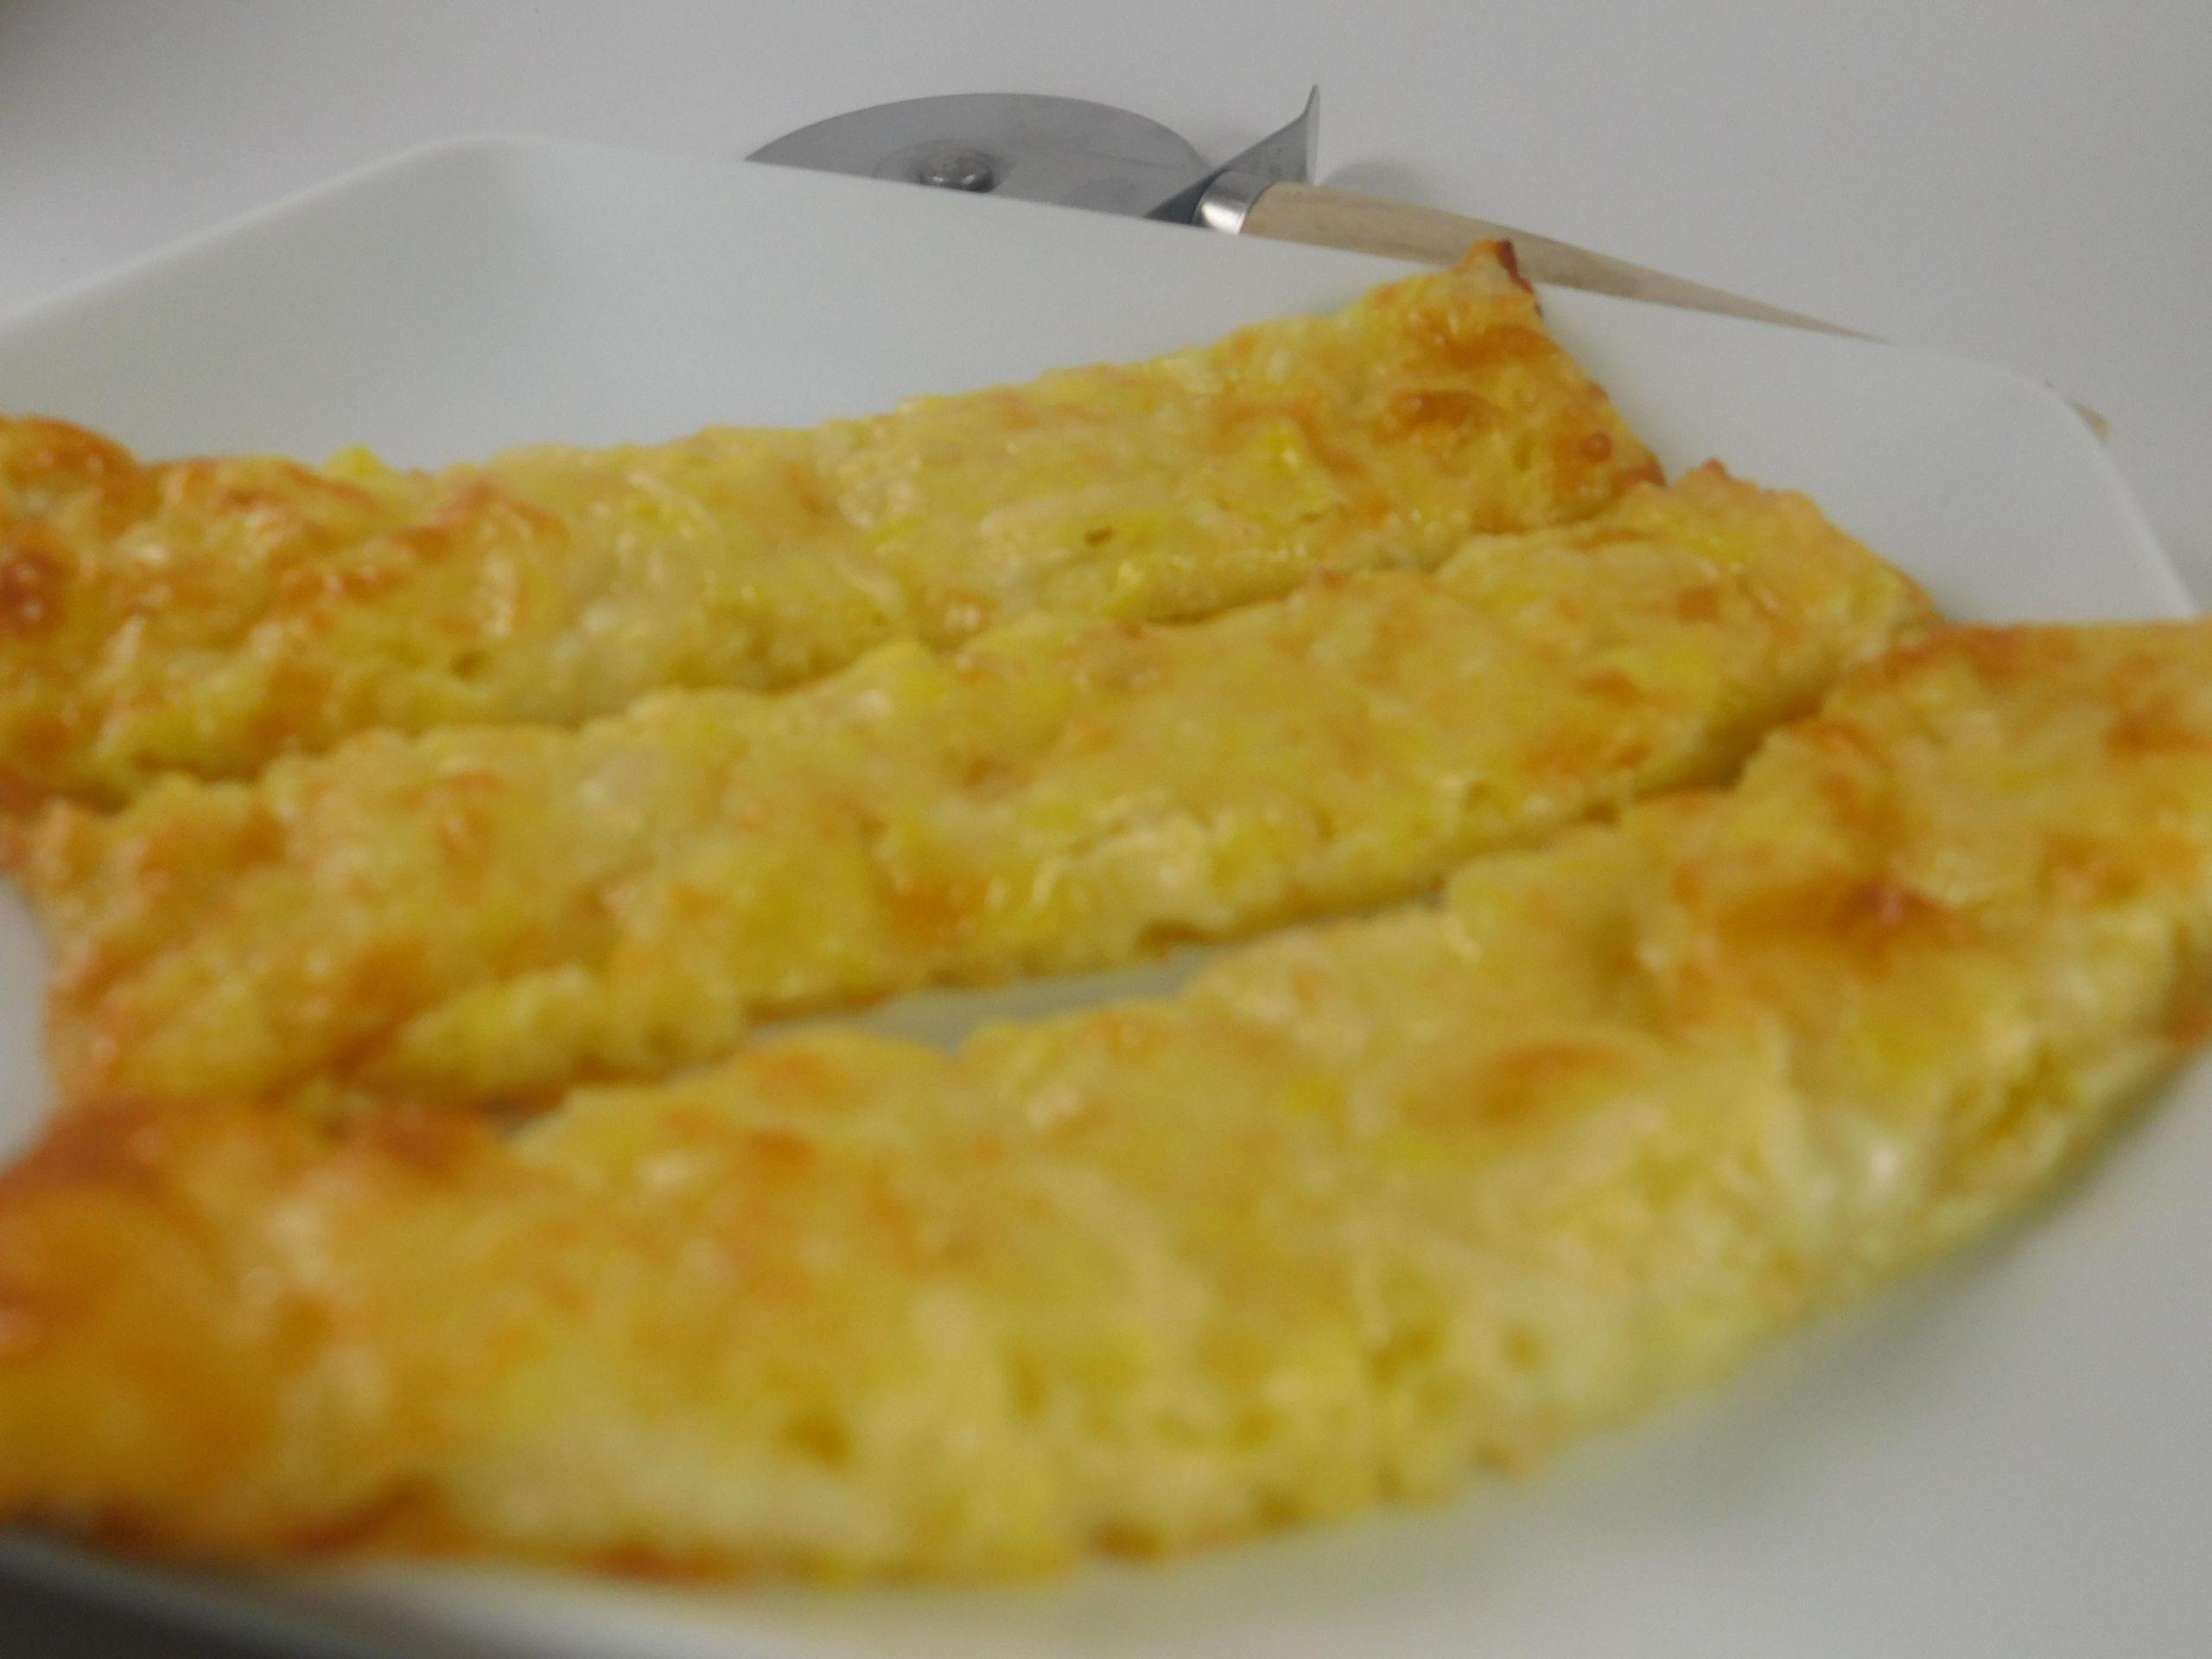 Low Carb Bread Sticks Garlic Breadsticks  Low Carb Garlic Bread Sticks – Faith4KetoKitchen